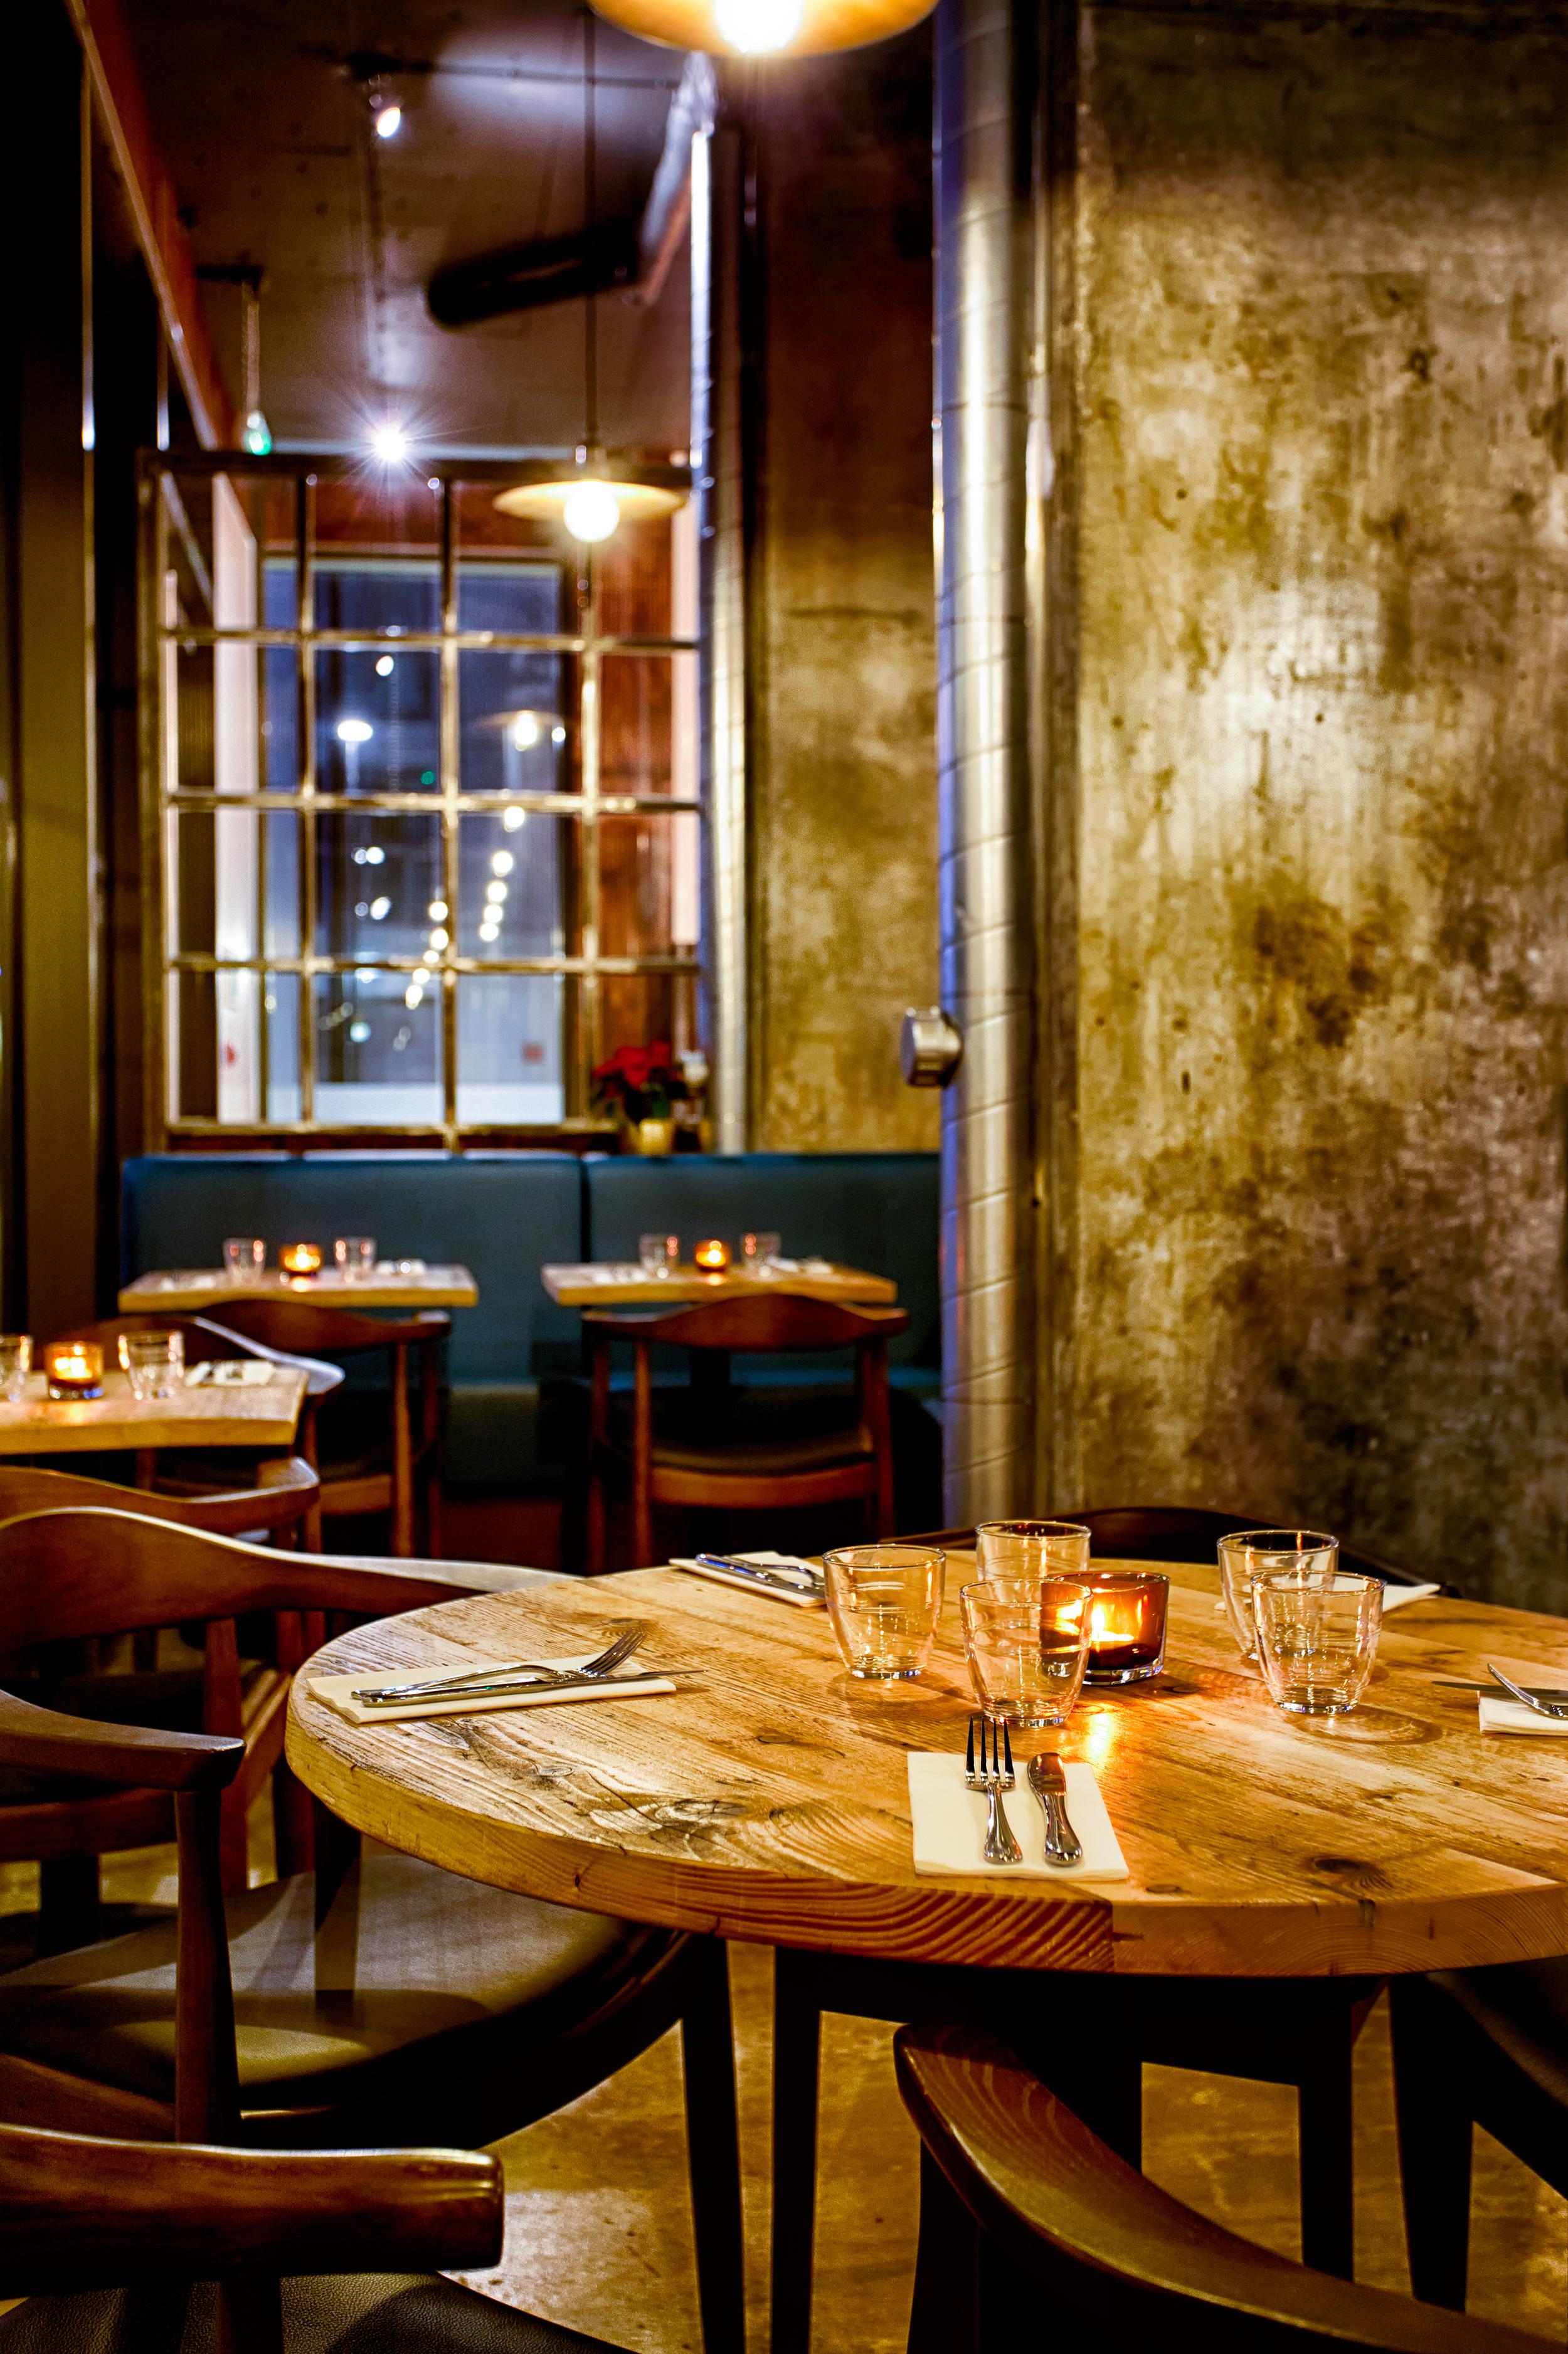 Darkhorse Restaurant_MG_3761_HDR_4.jpg